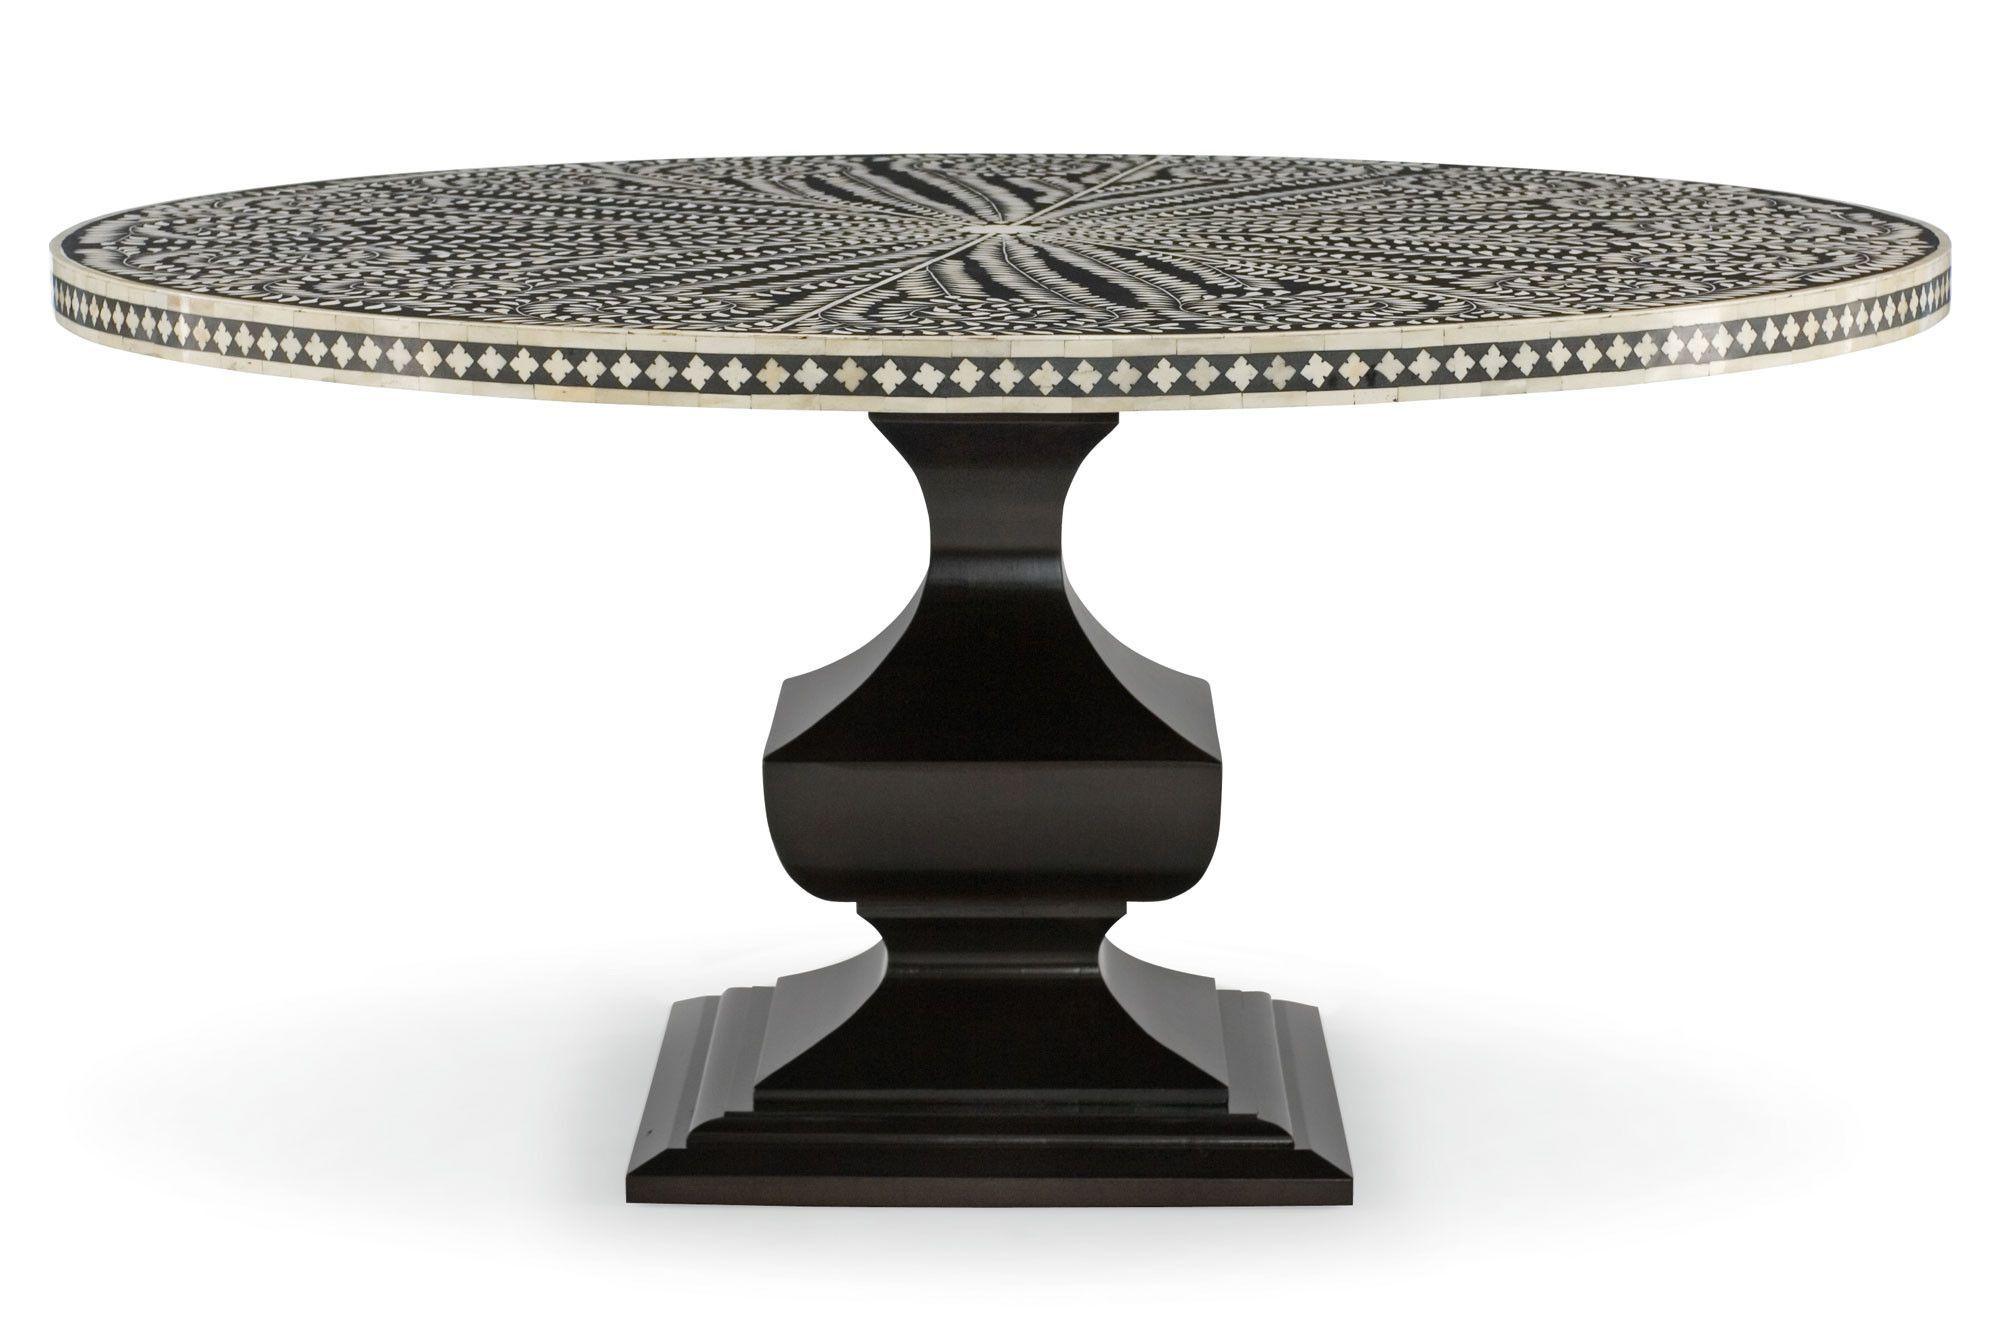 Barnsley Dining Table Bernhardt Dining Table Pedestal Dining